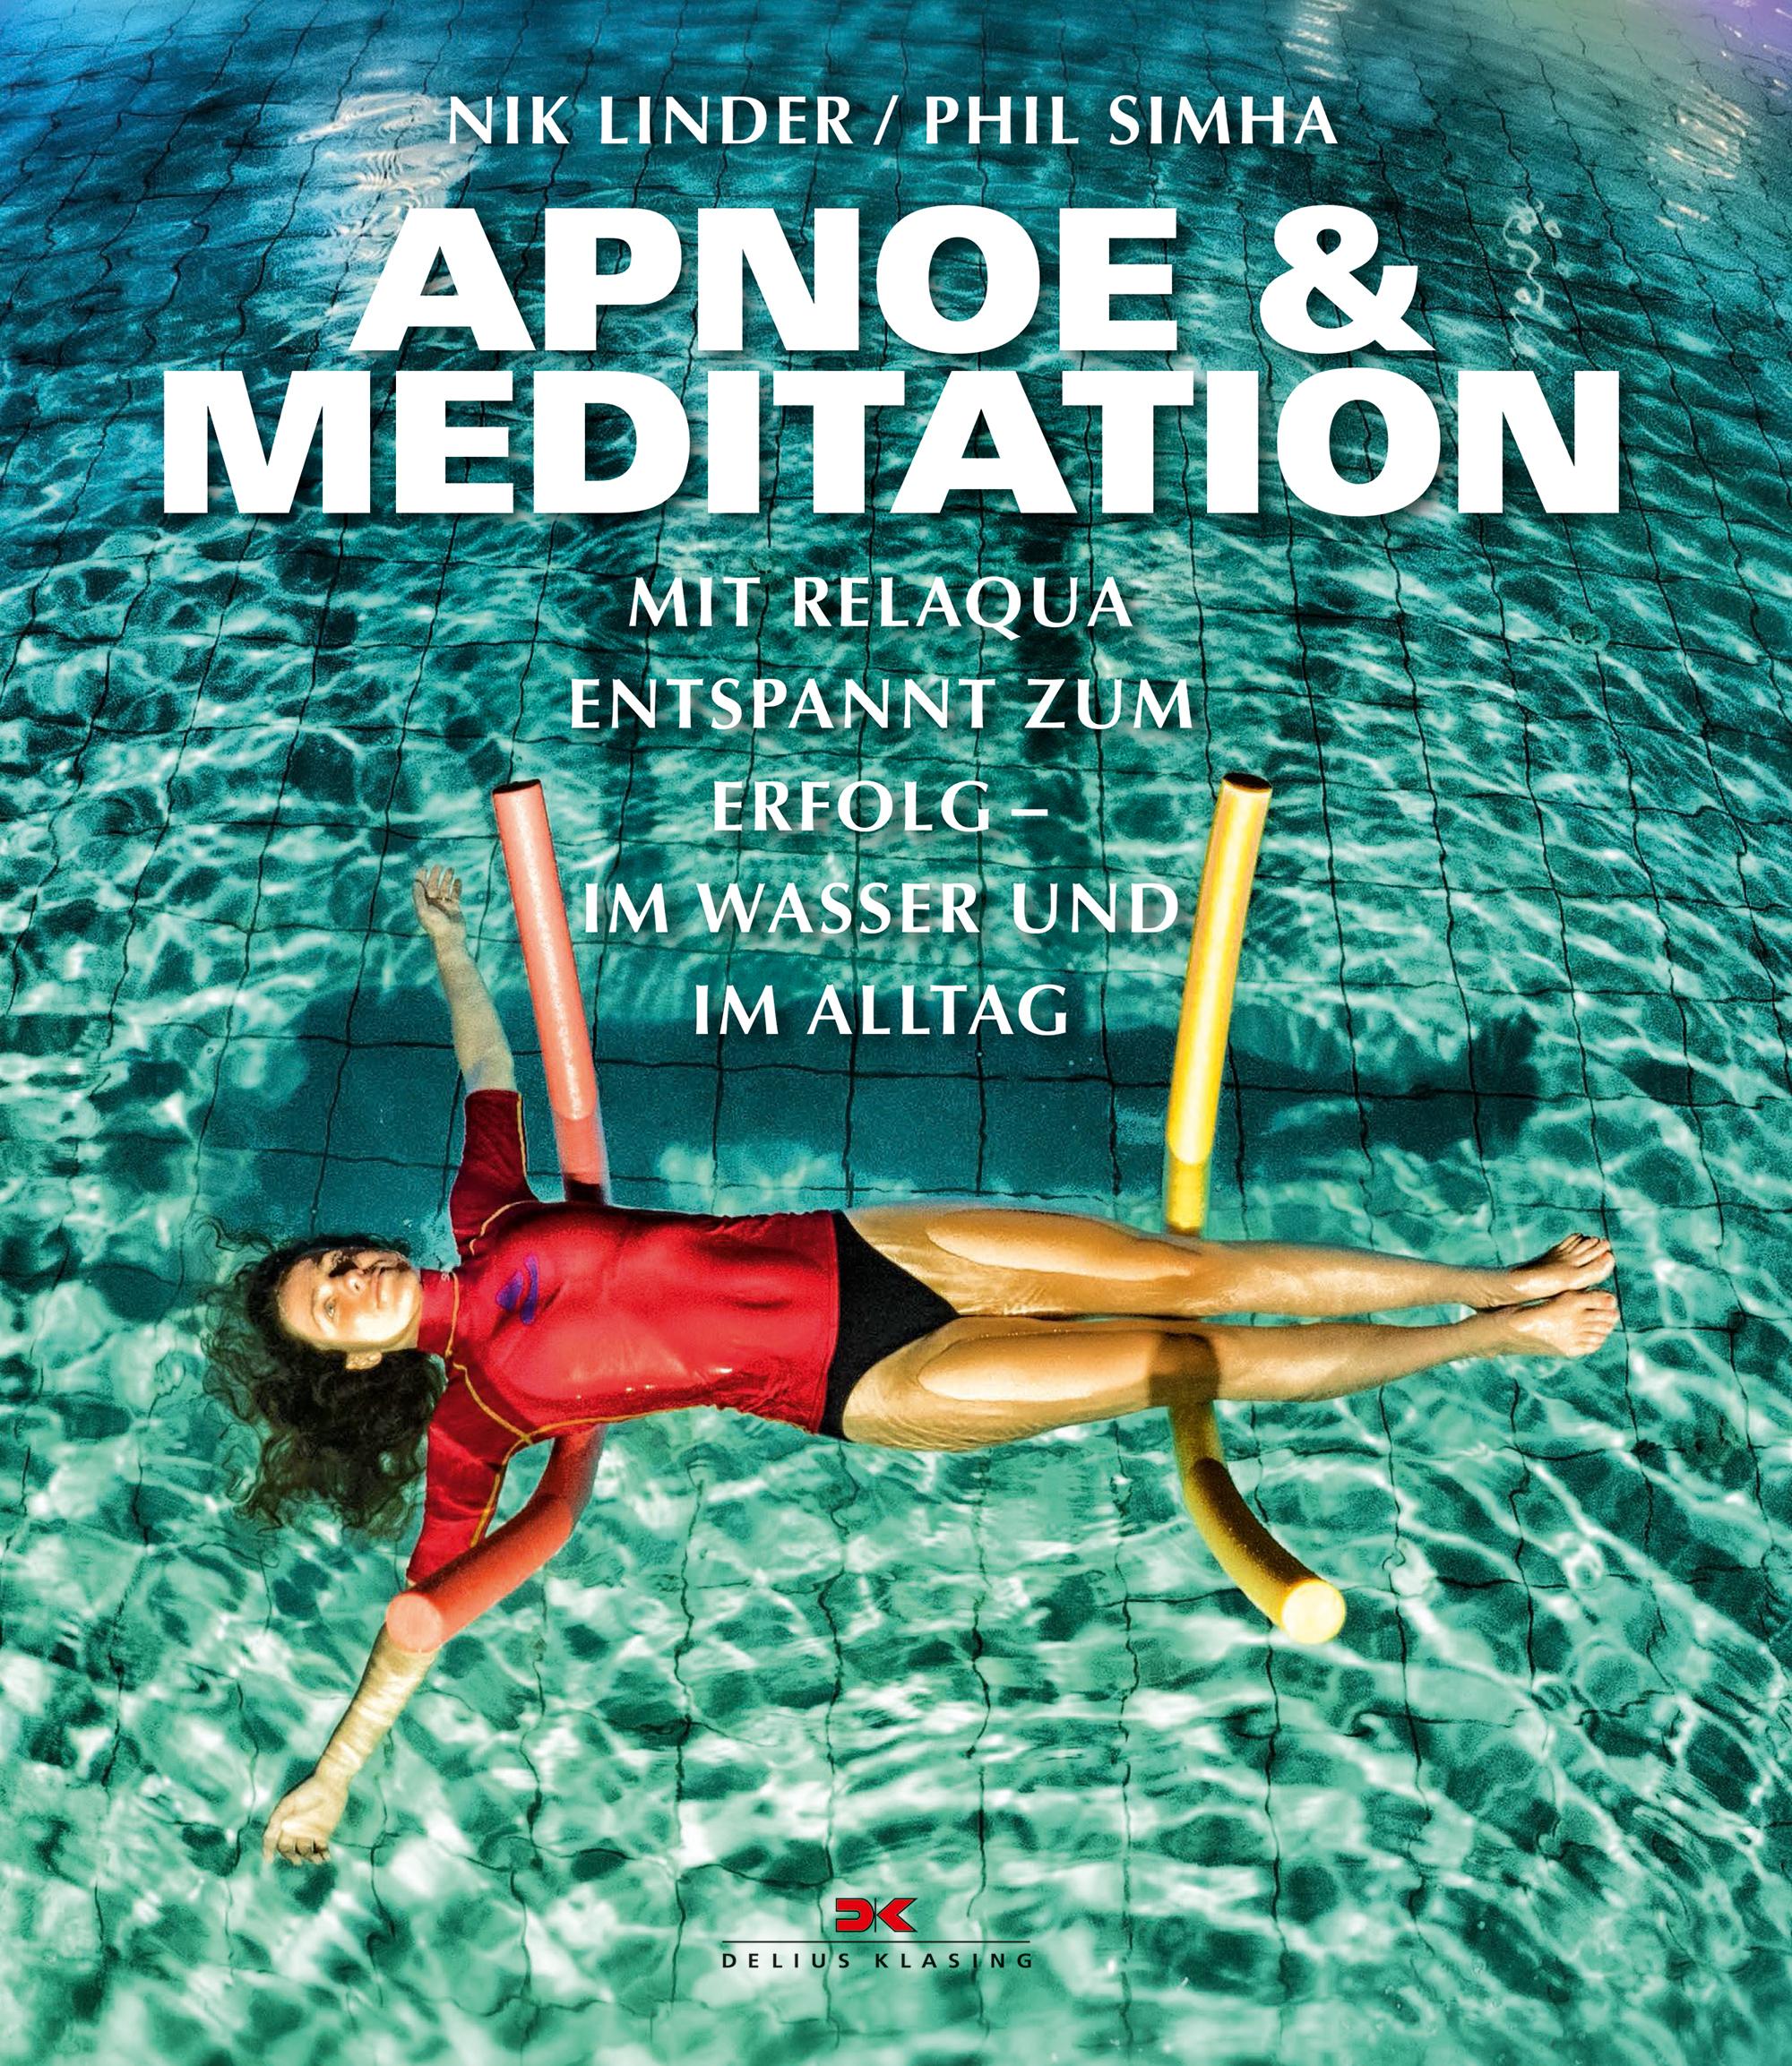 APNOE & MEDITATION